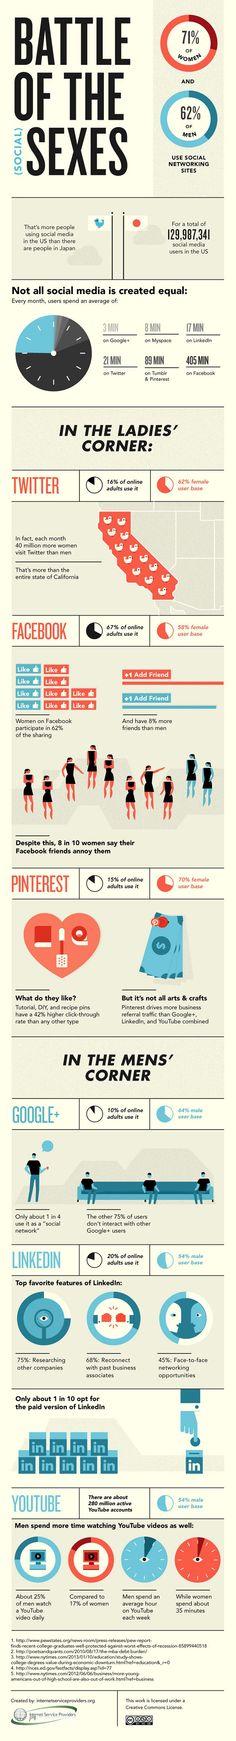 Social battle of the sexes #infografia #infographic #socialmedia